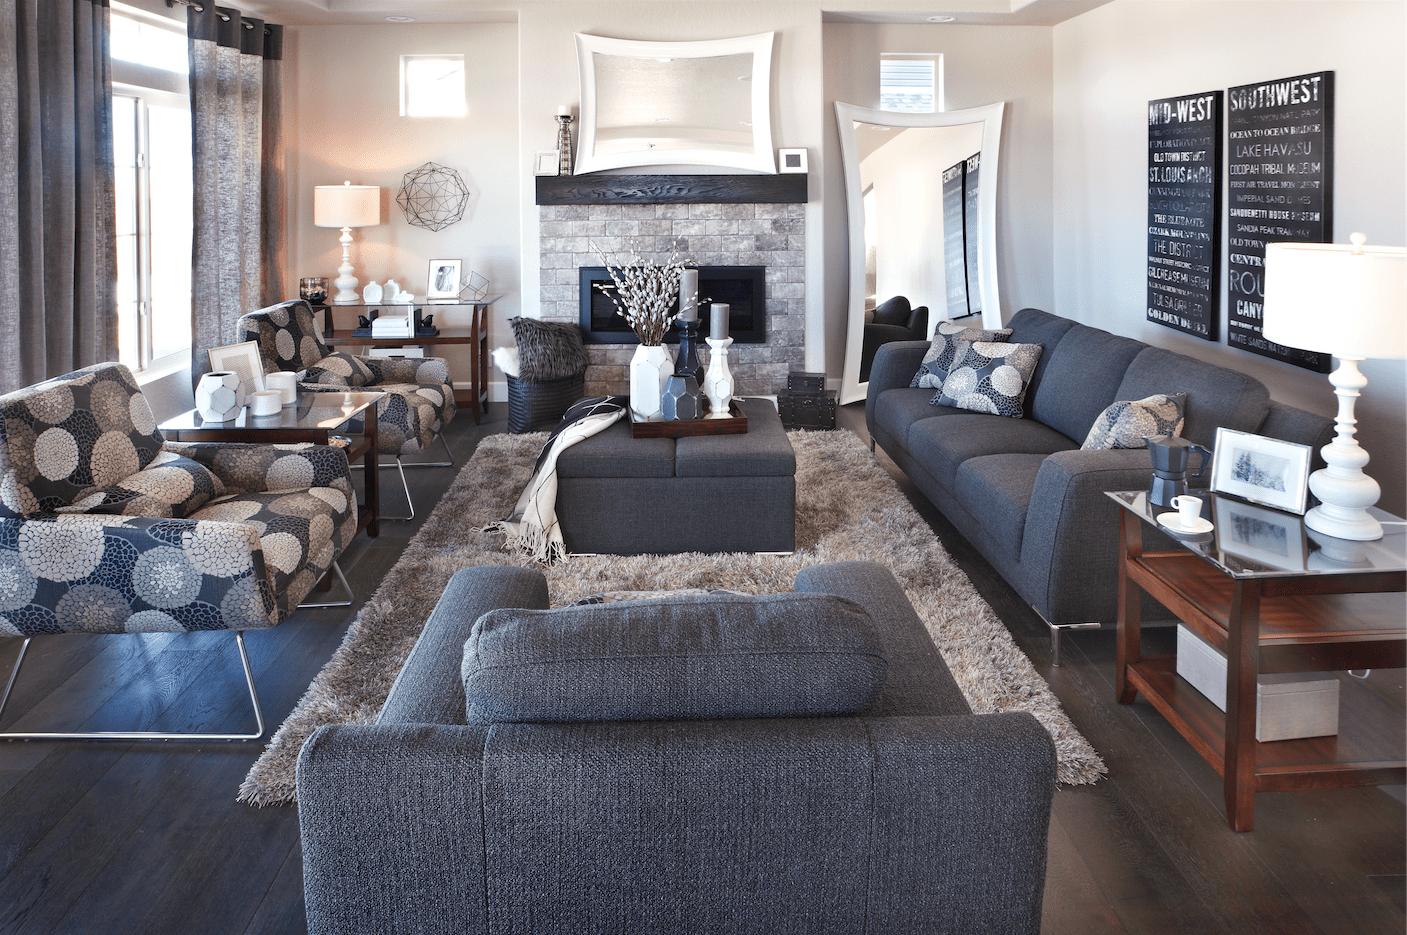 Sofa Mart Amarillo Tx Furniturerow Com 806 353 3100